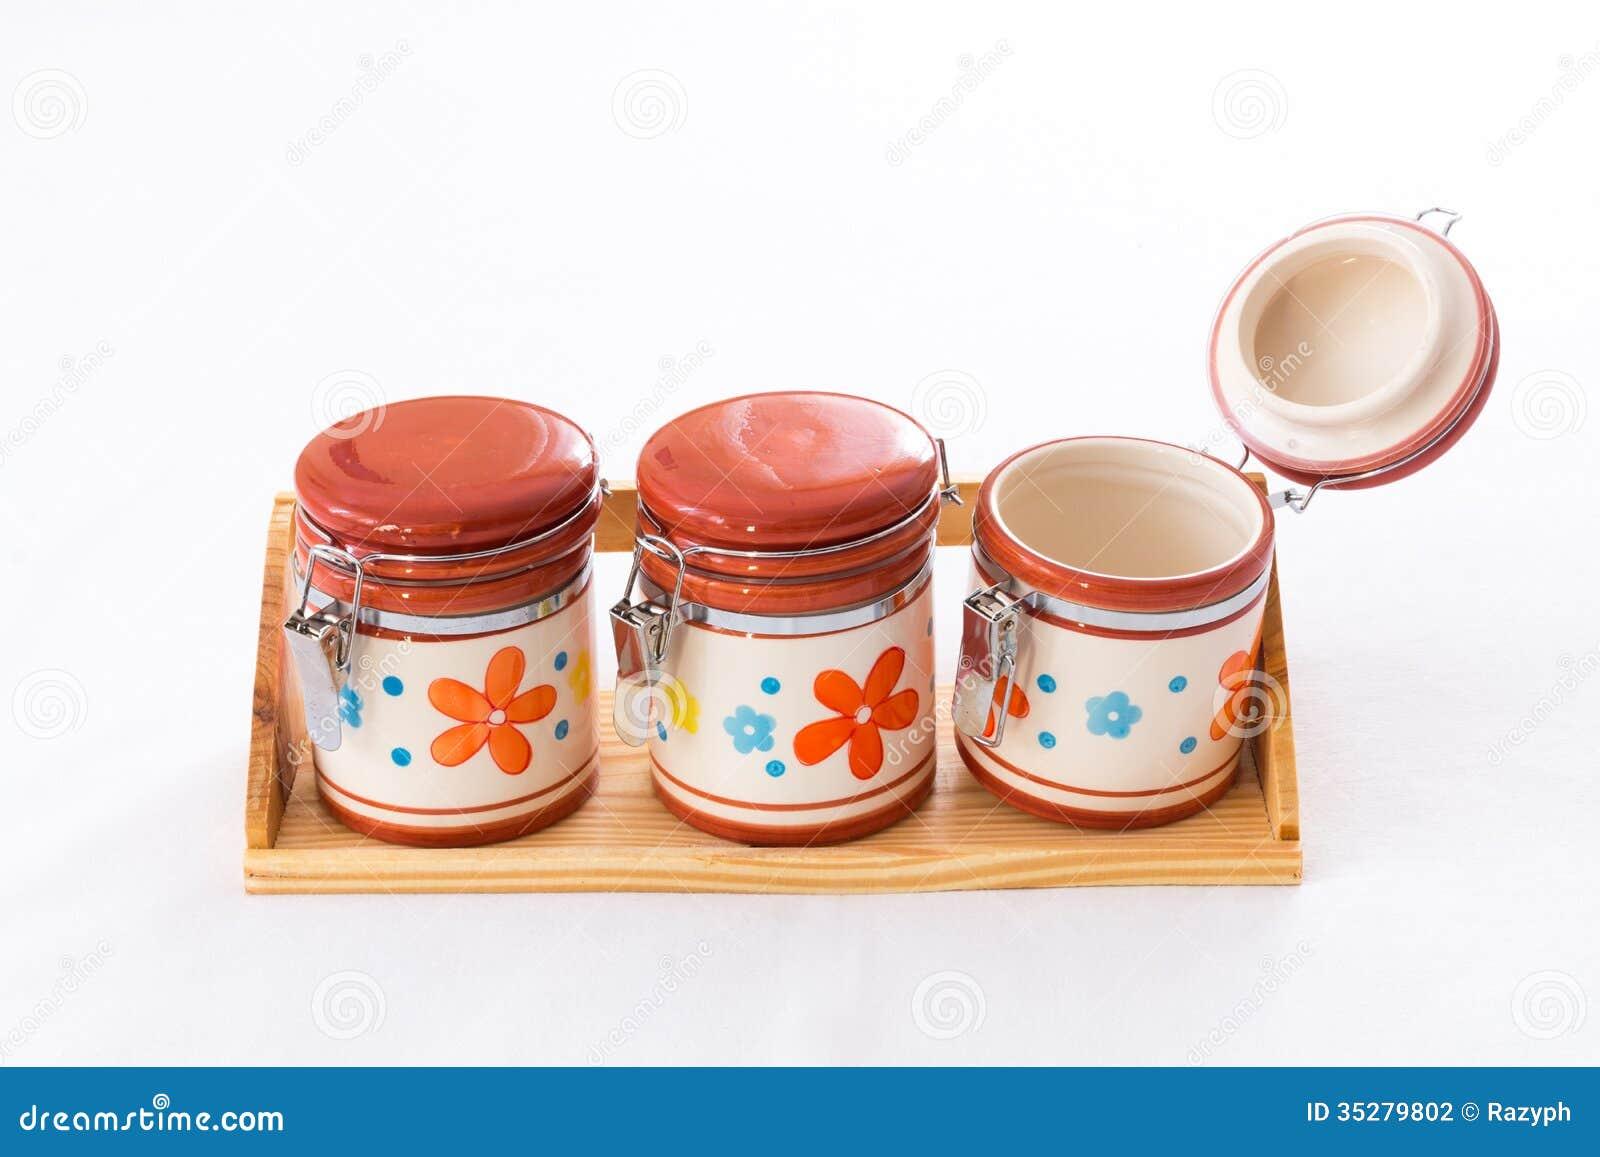 Best Barattoli Cucina Colorati Pictures - Embercreative.us ...